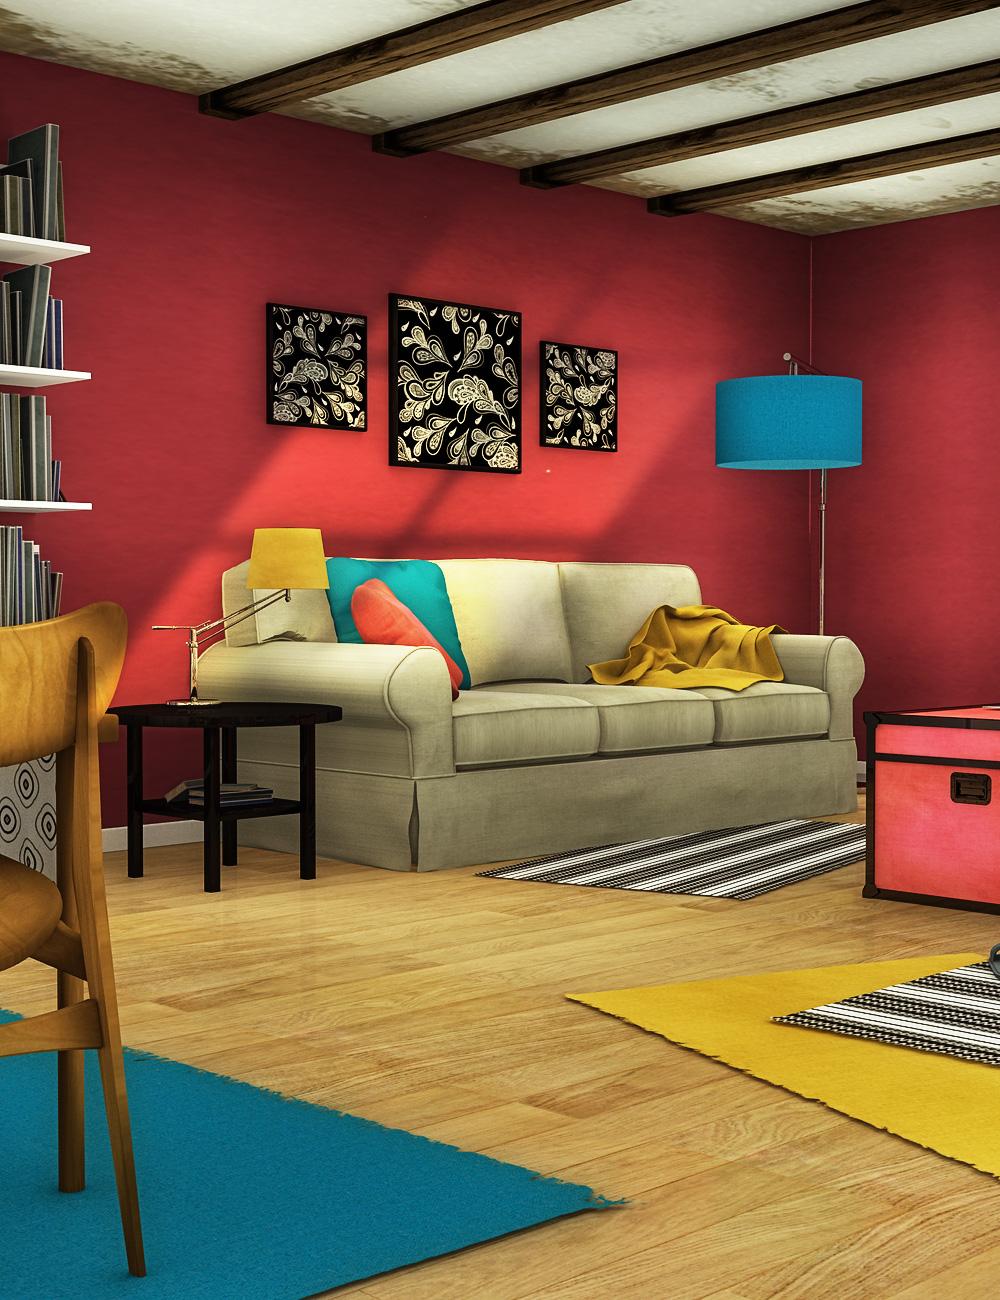 A Cozy Studio by: , 3D Models by Daz 3D